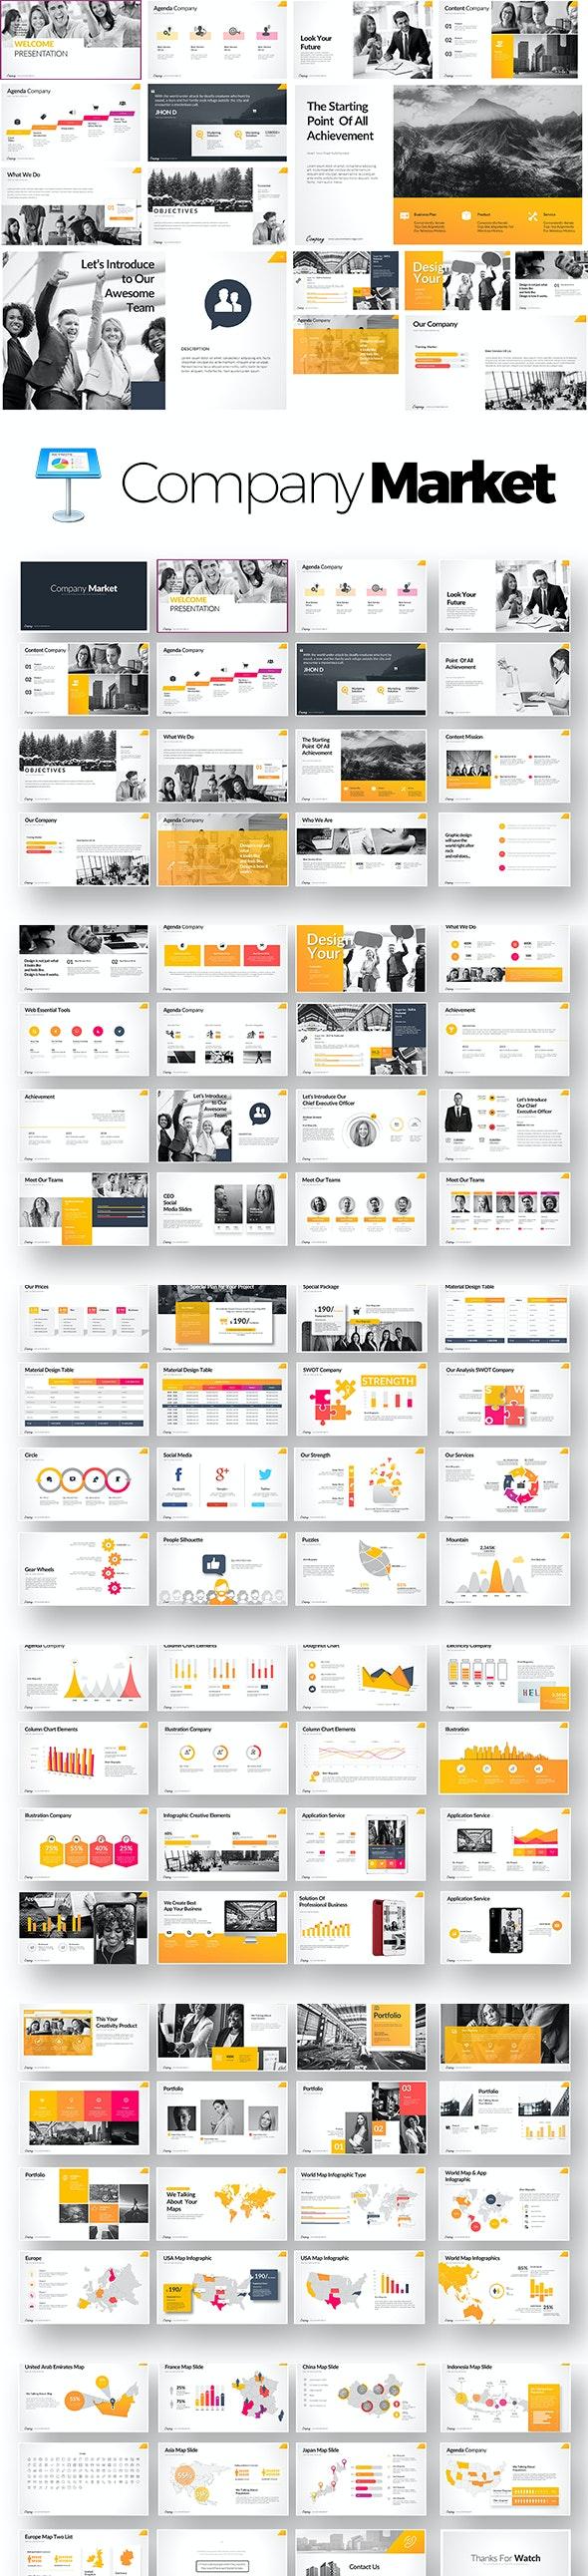 Company Market Keynote Templates - Keynote Templates Presentation Templates